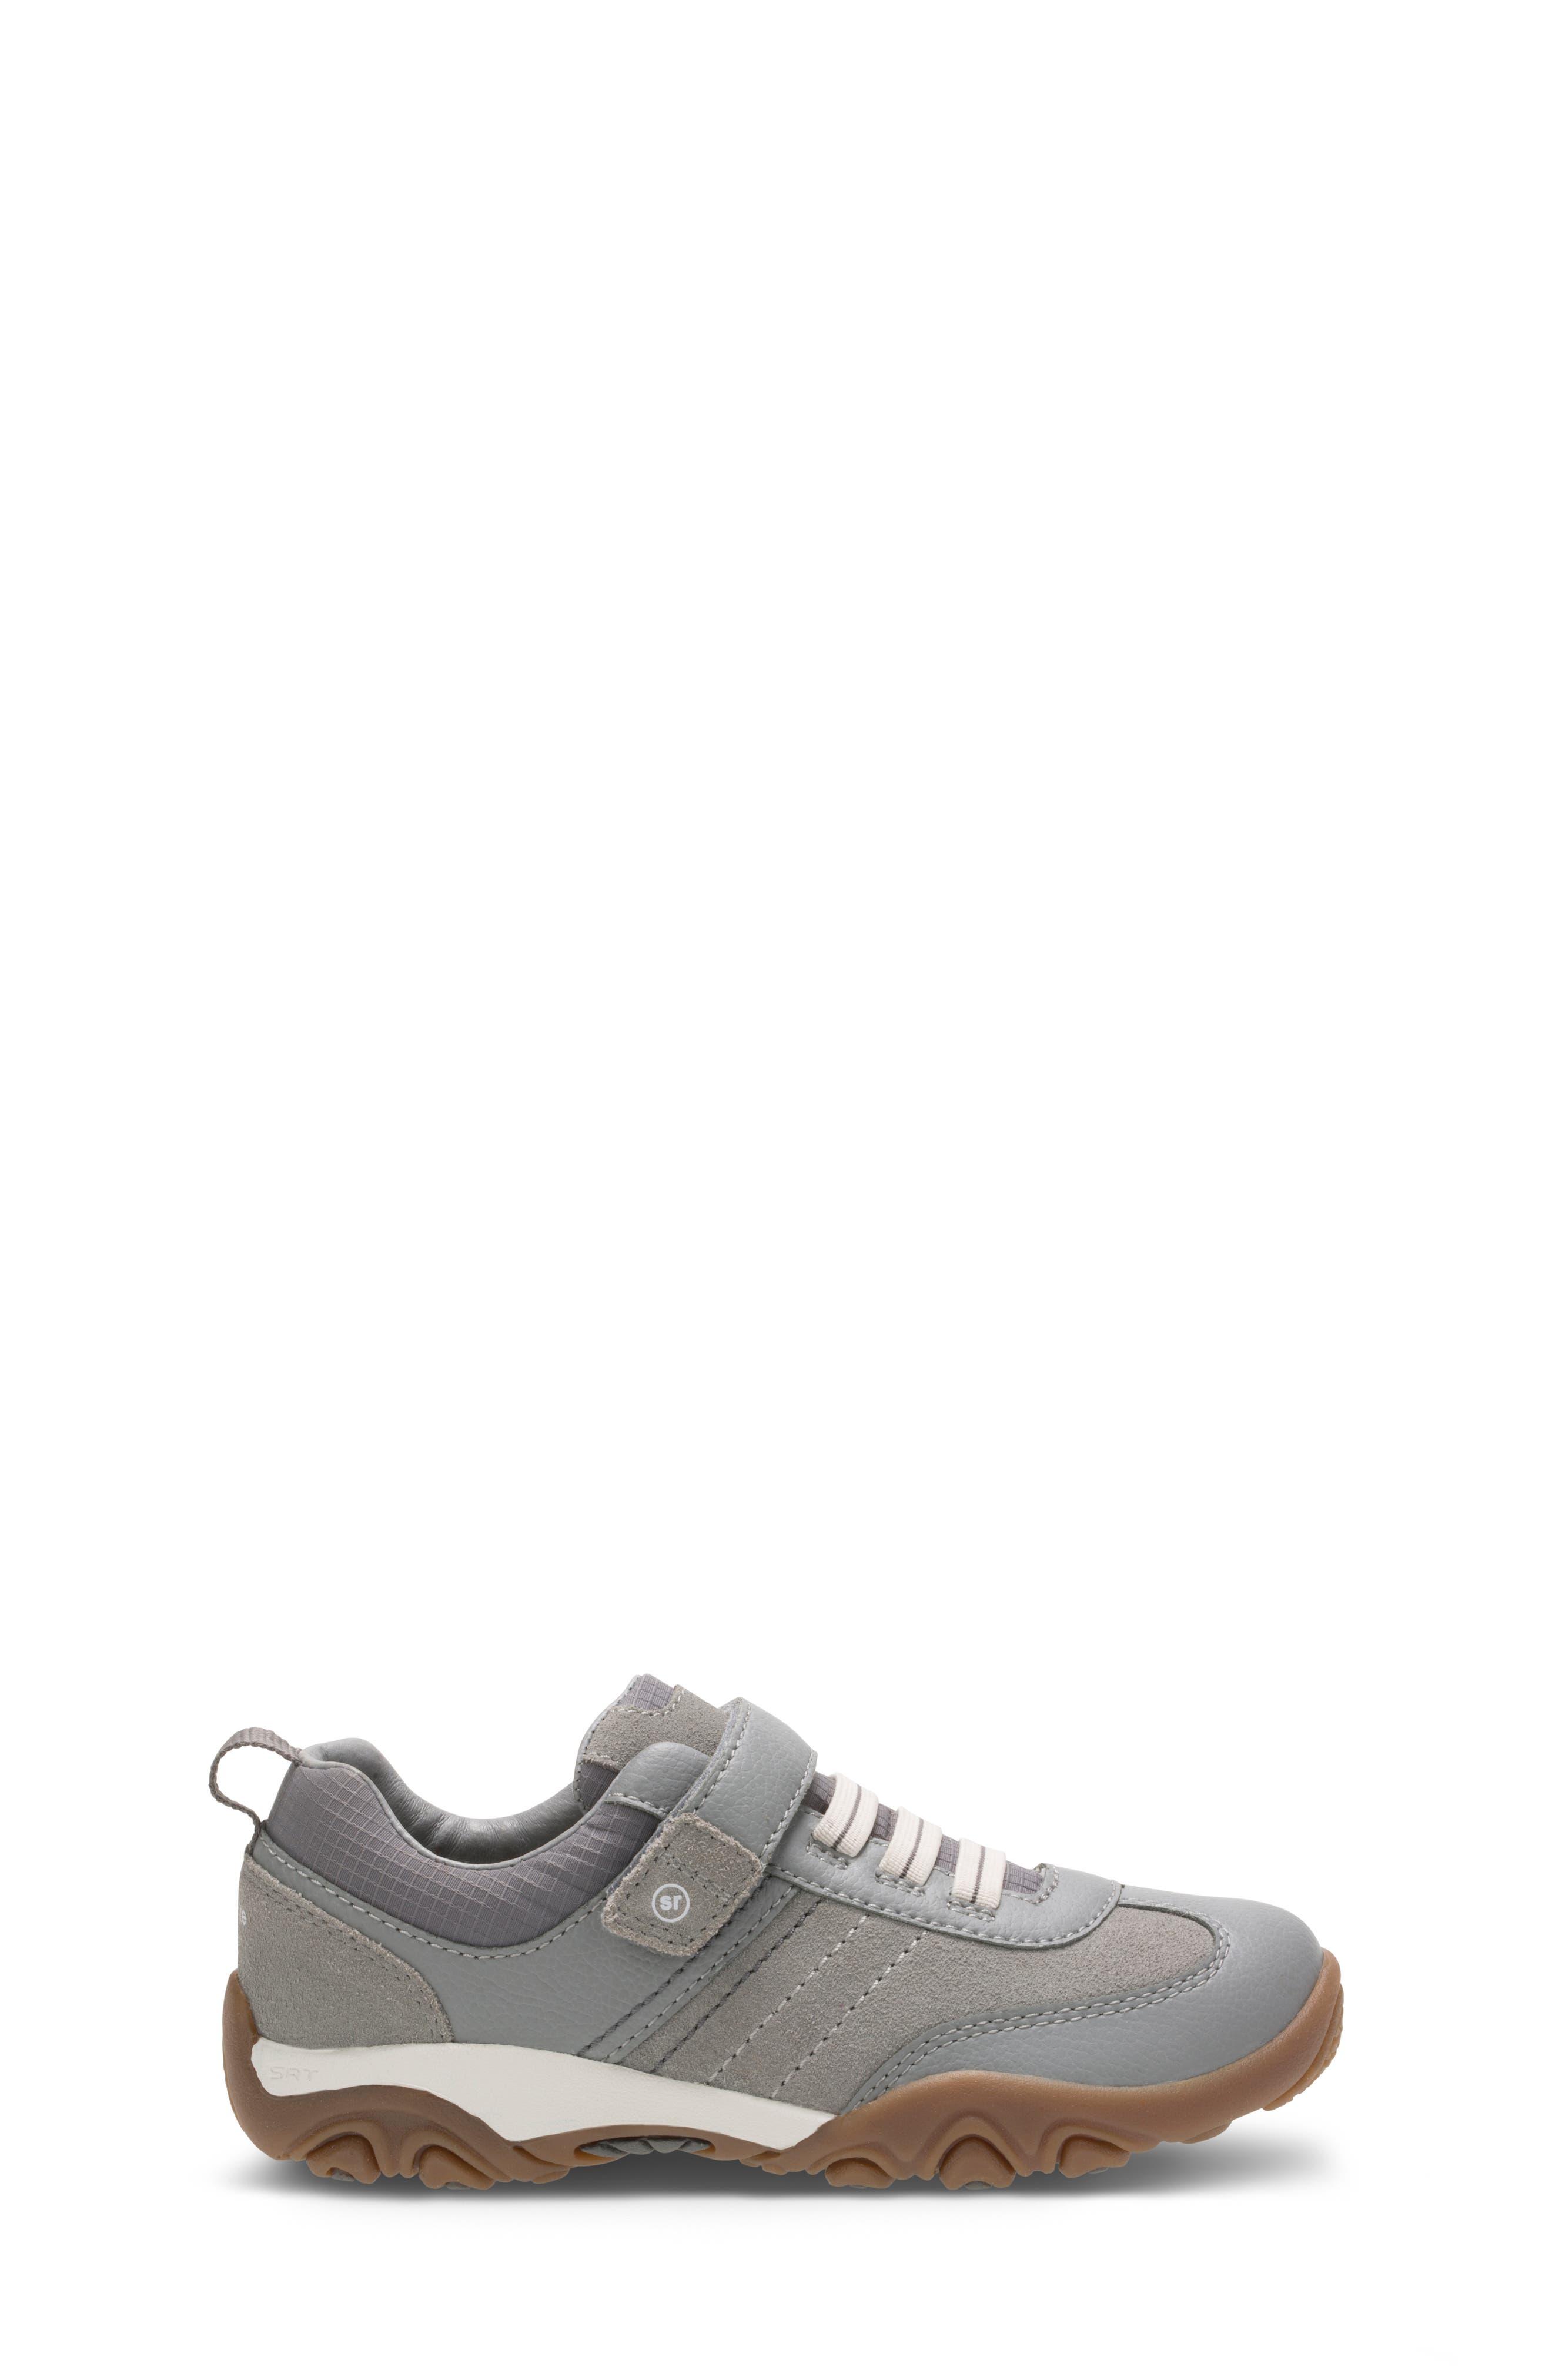 Prescott Sneaker,                             Alternate thumbnail 3, color,                             GREY